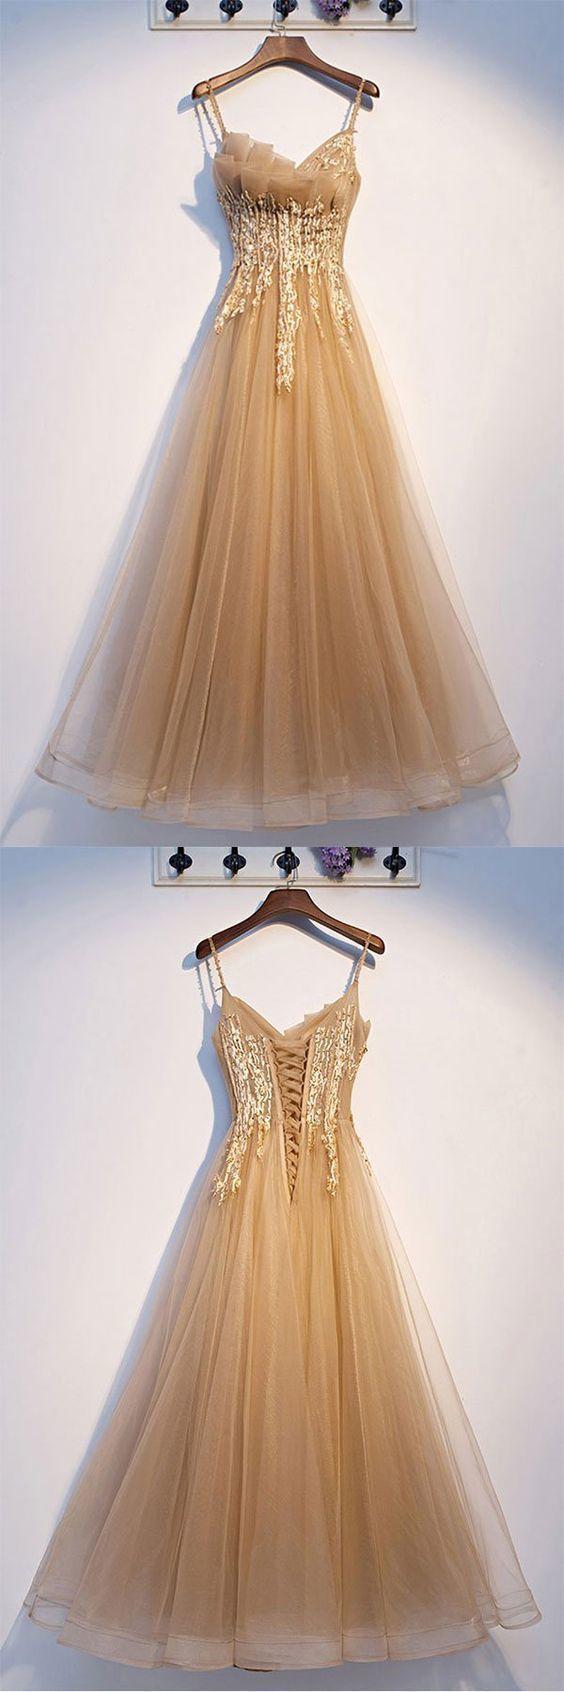 Elegant Spaghetti Straps Champagne Tulle Long Prom Dress T1937